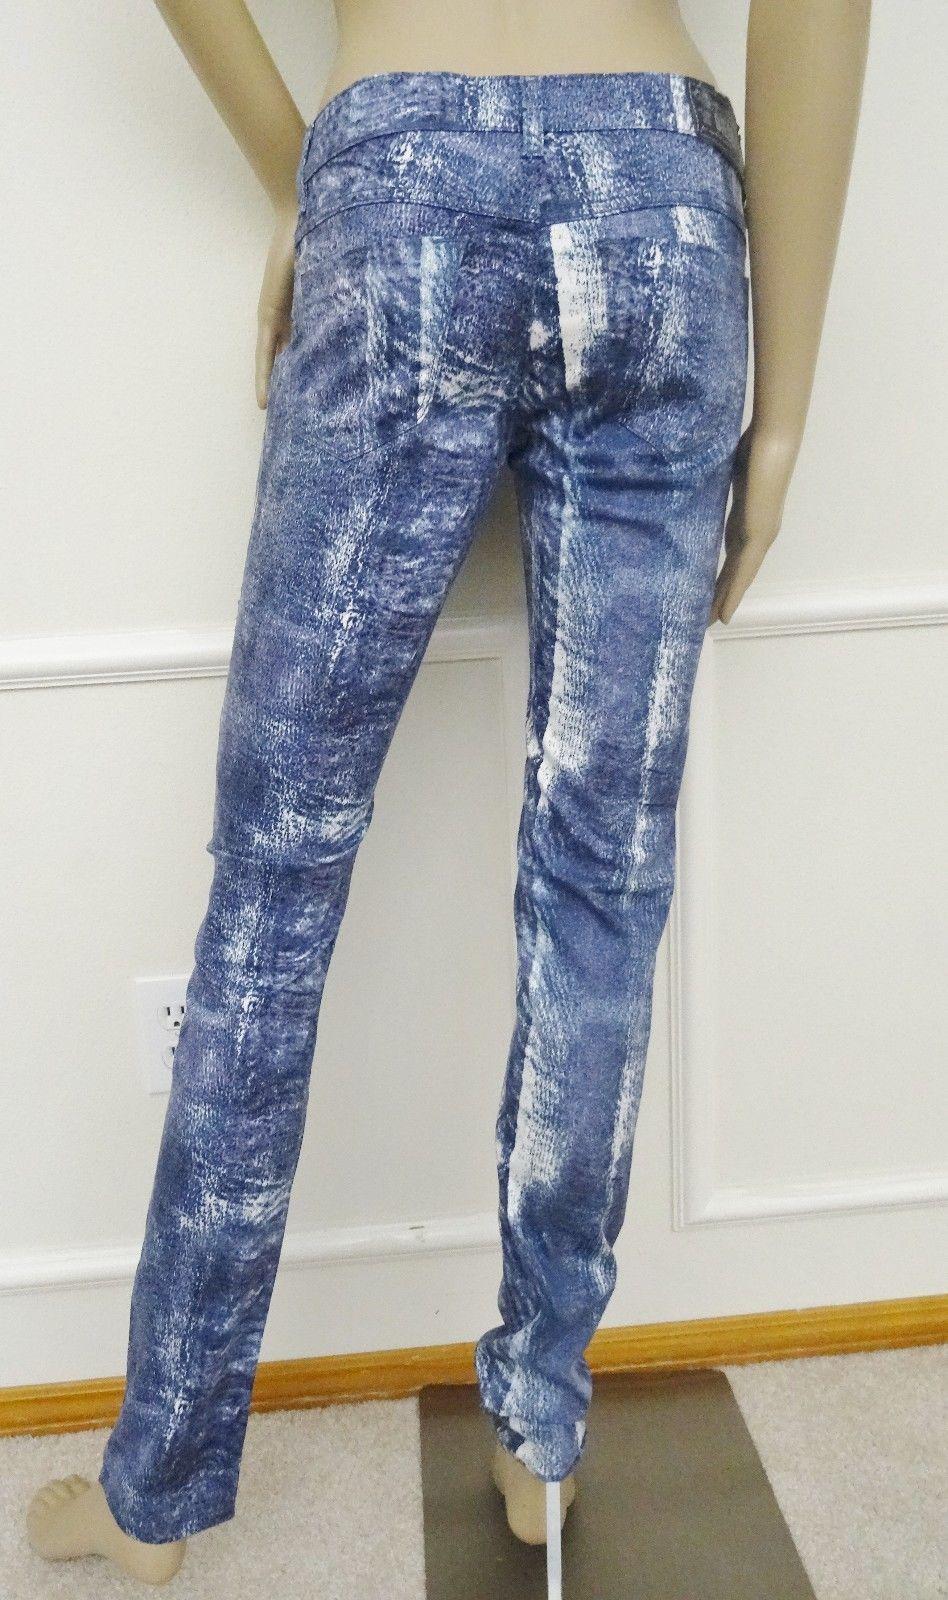 cdf6e6e3 Nwt Designer DIESEL Livier SP Low Waist Super Skinny Jegging 26 2 Snakeskin  Blue